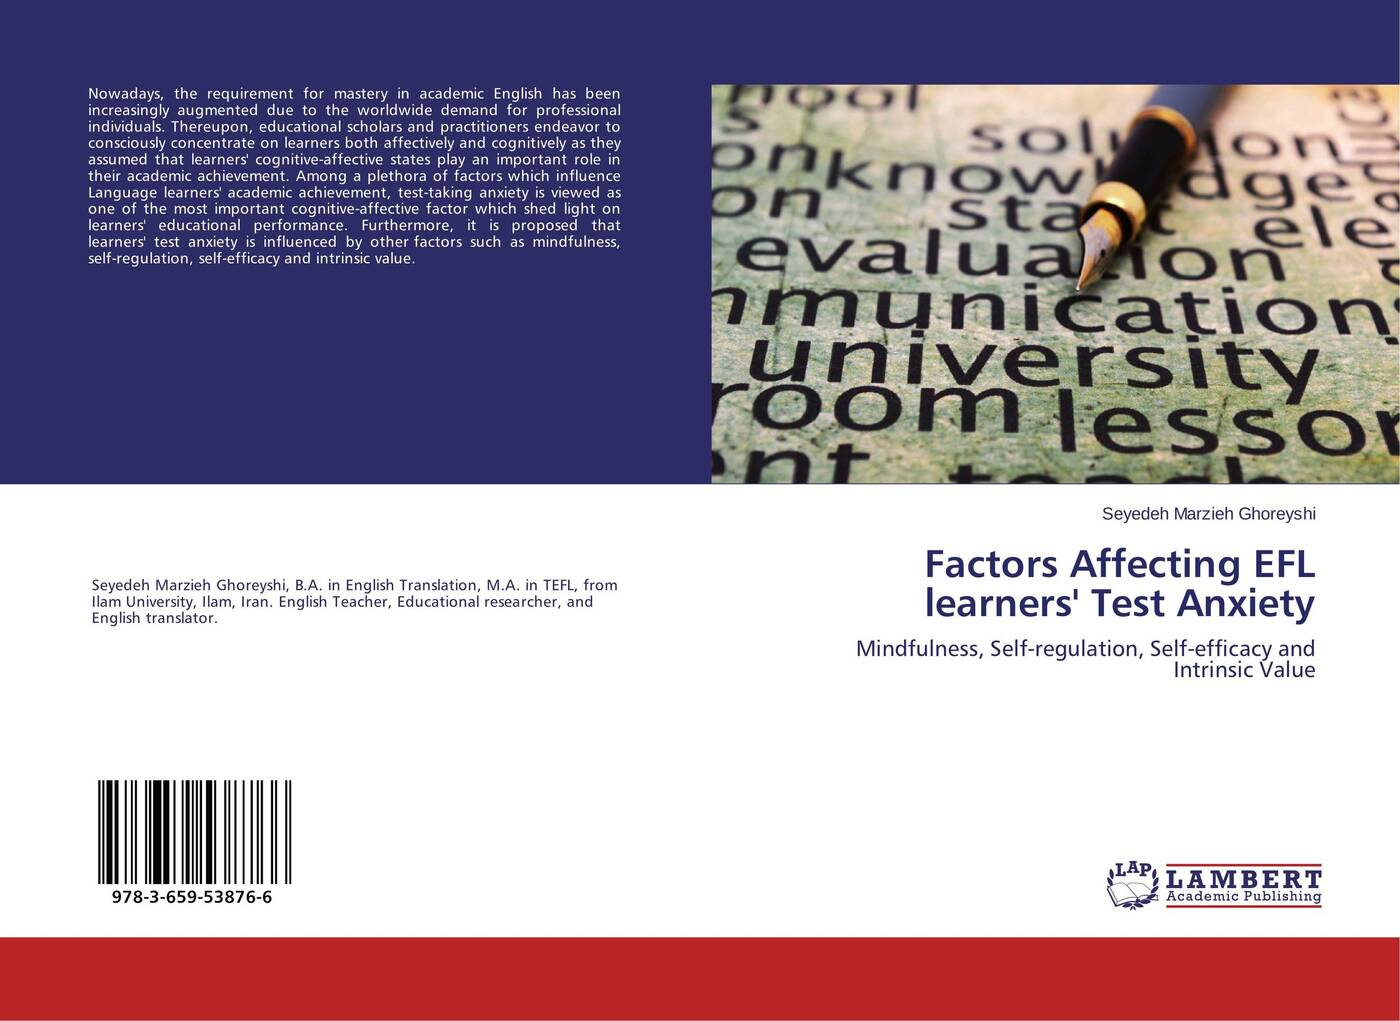 educational film reviewing factors - HD1400×1021